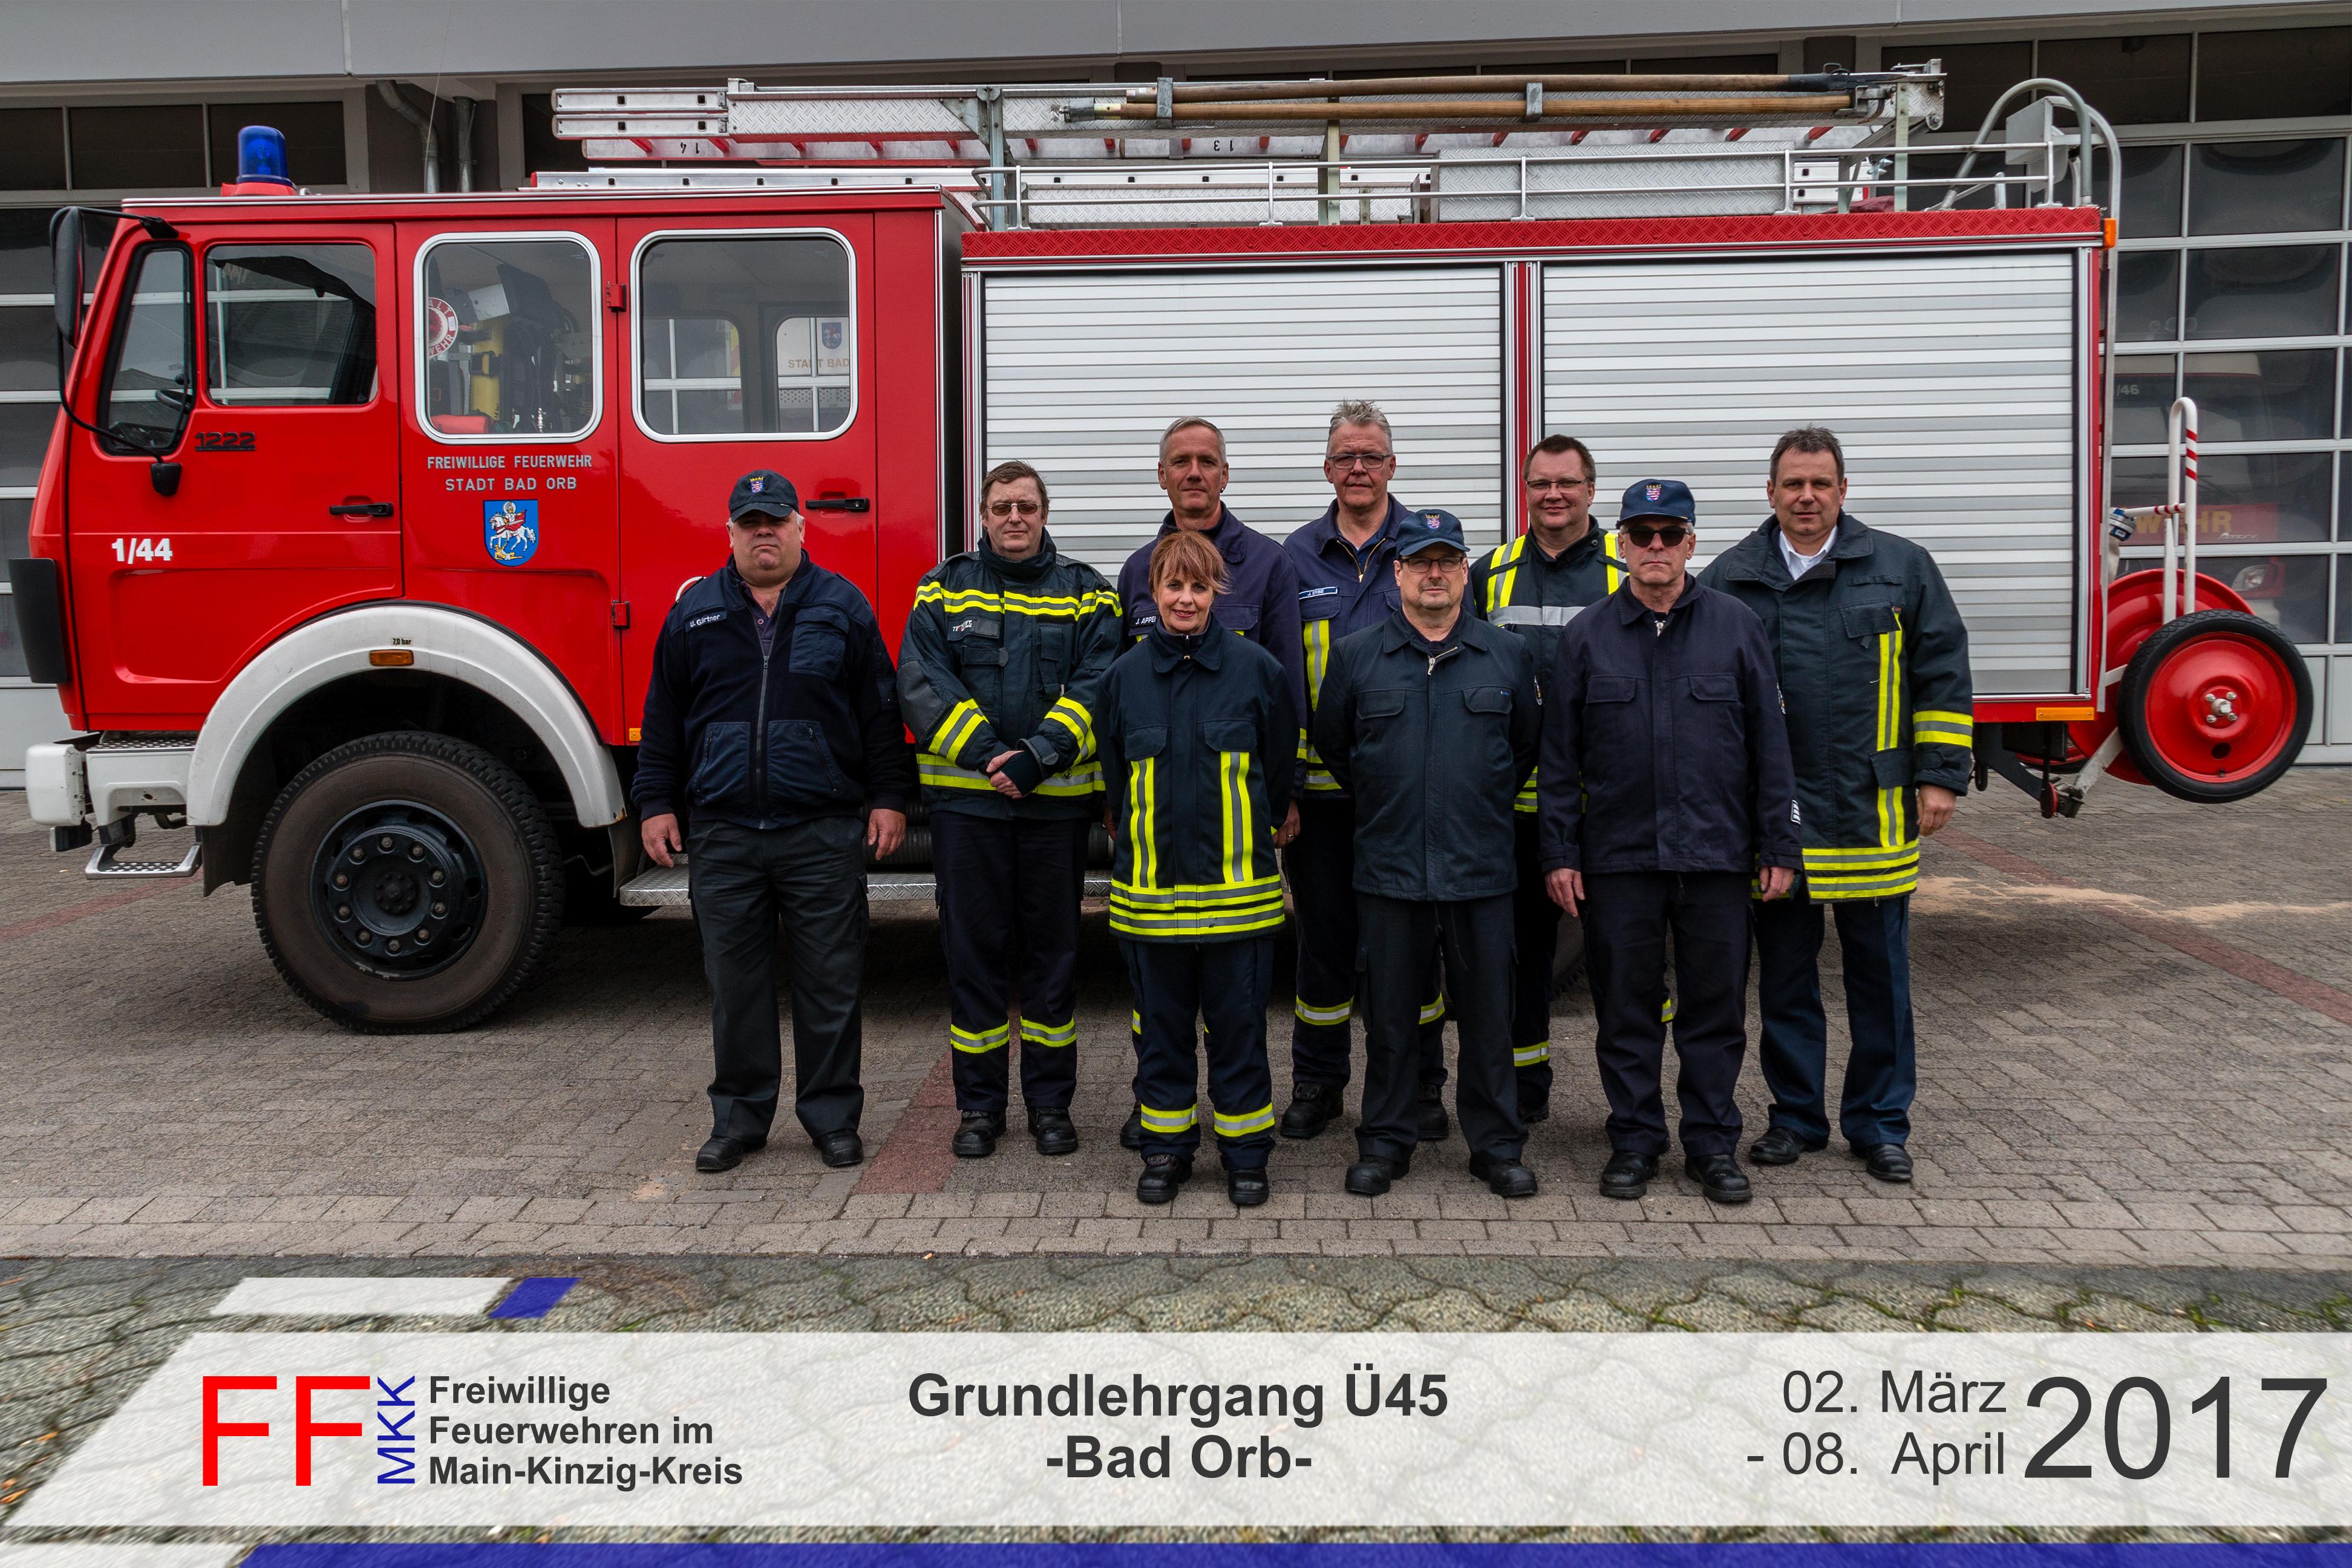 04-2017 Grundlehrgang Ü45 Bad Orb